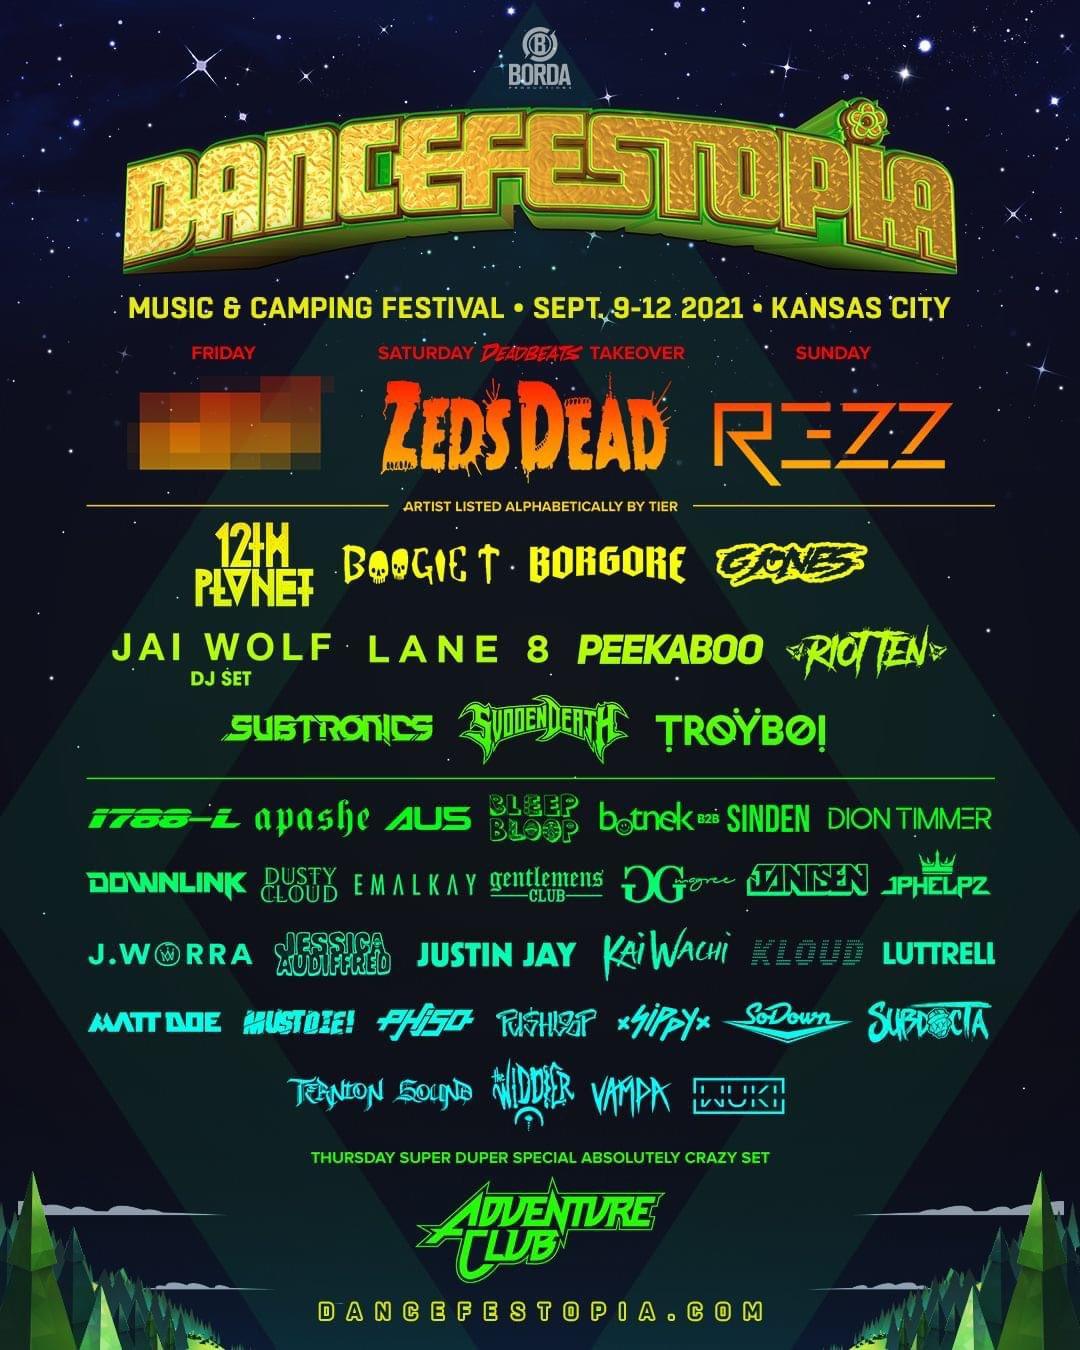 Dancefestopia lineup 2021